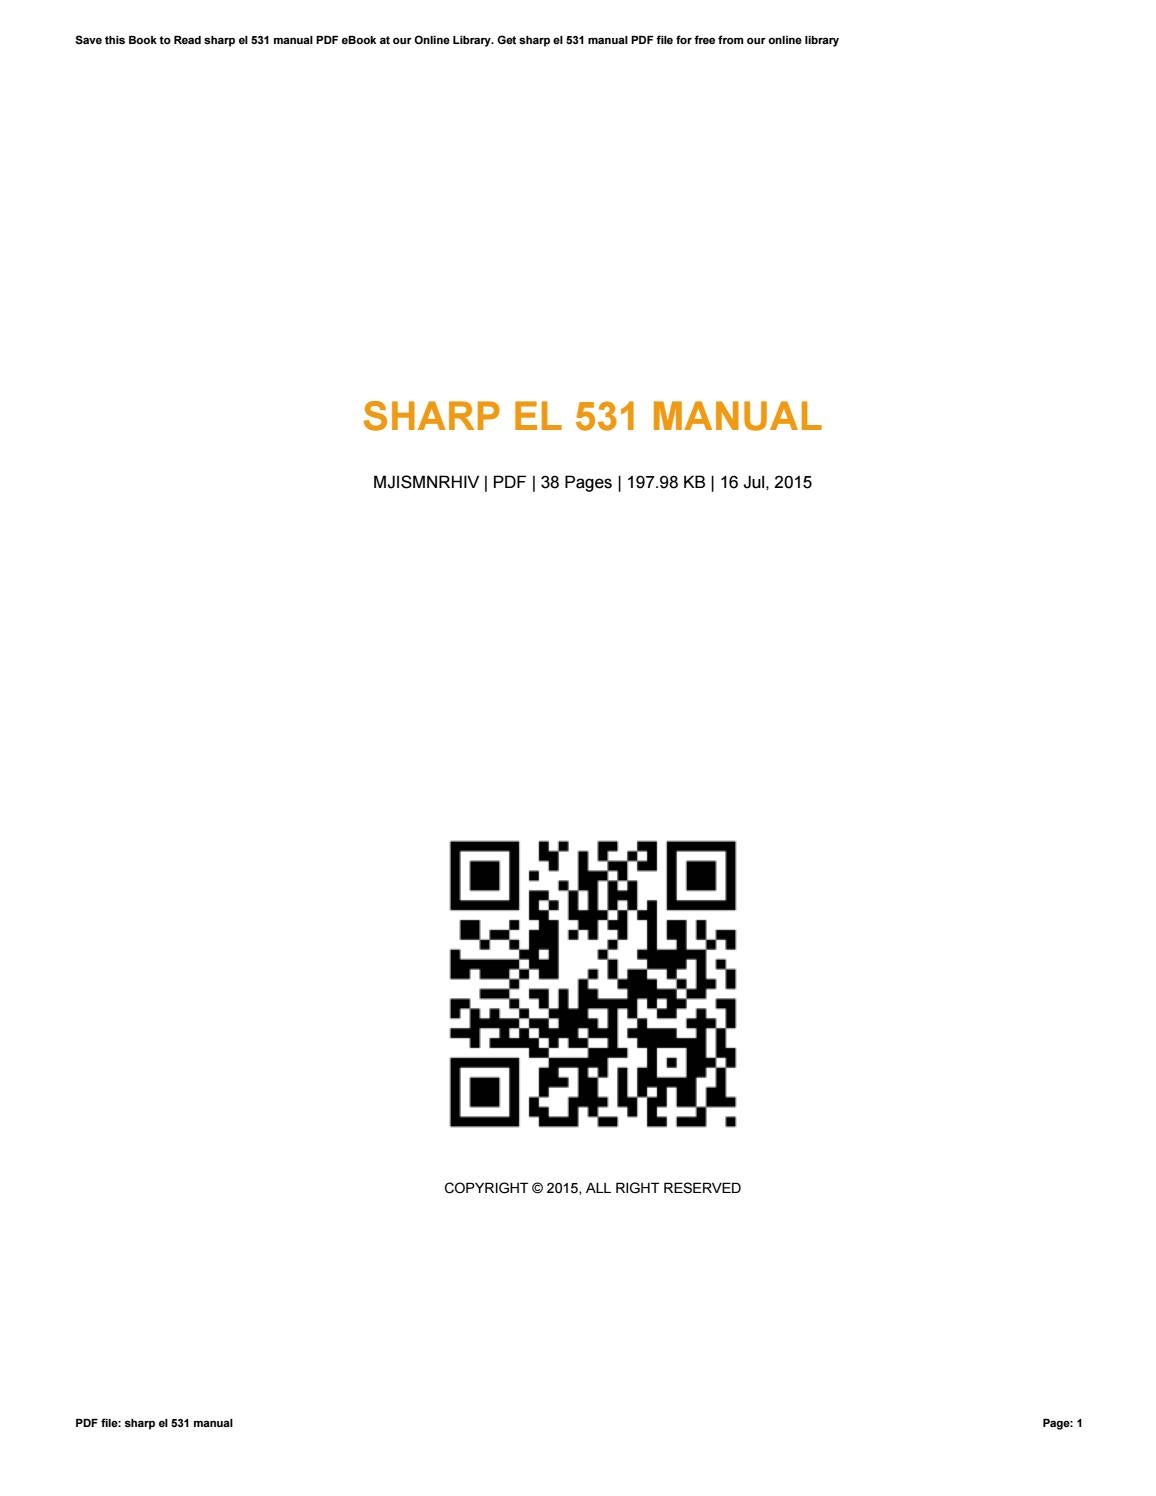 Sharp el 531 manual by JamesMcCarthy4818 - issuu